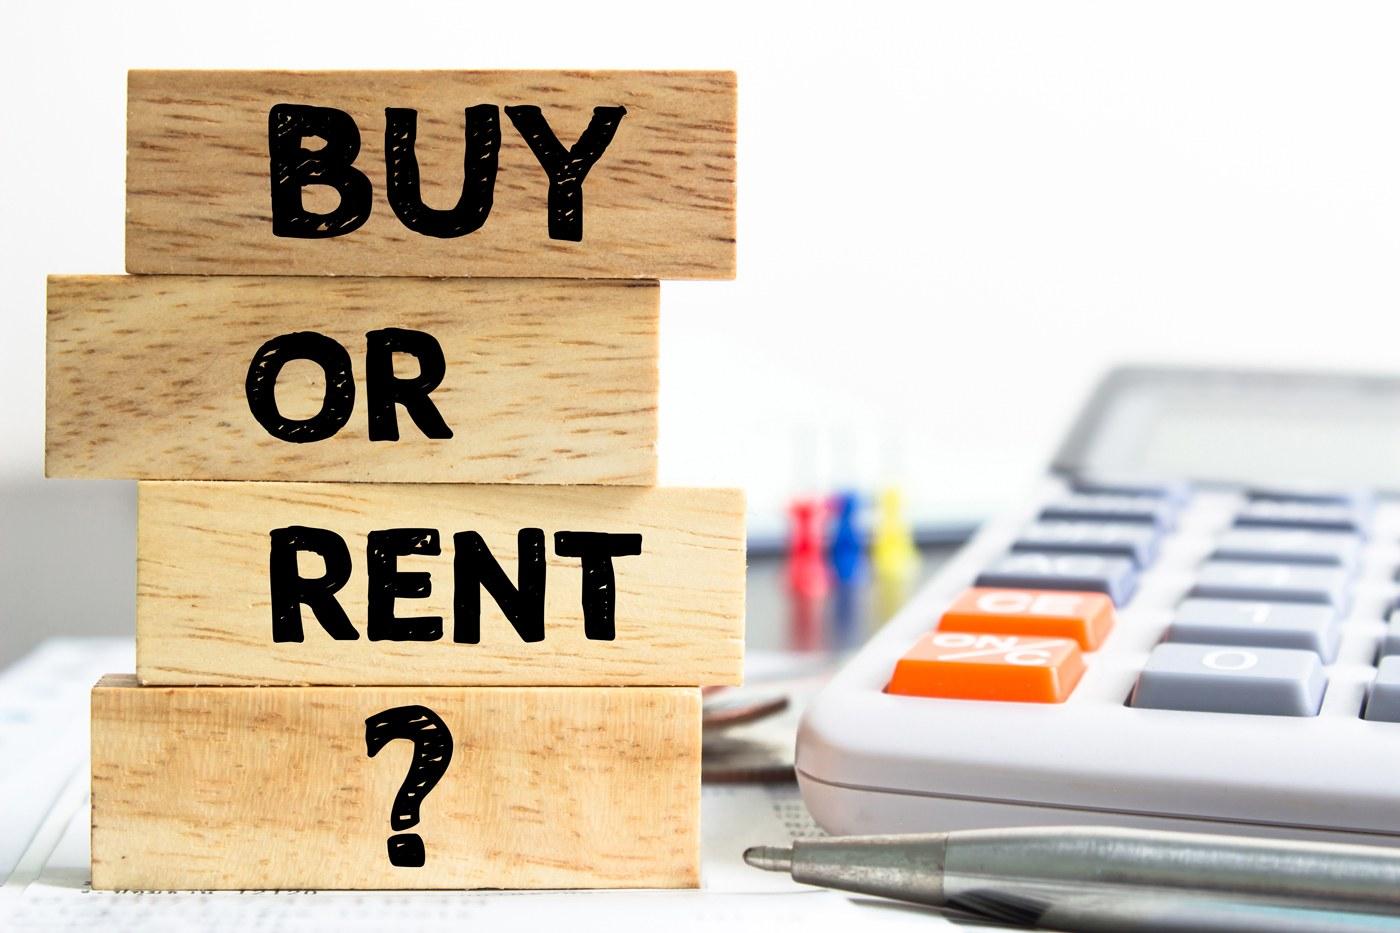 buy or rent written on blocks